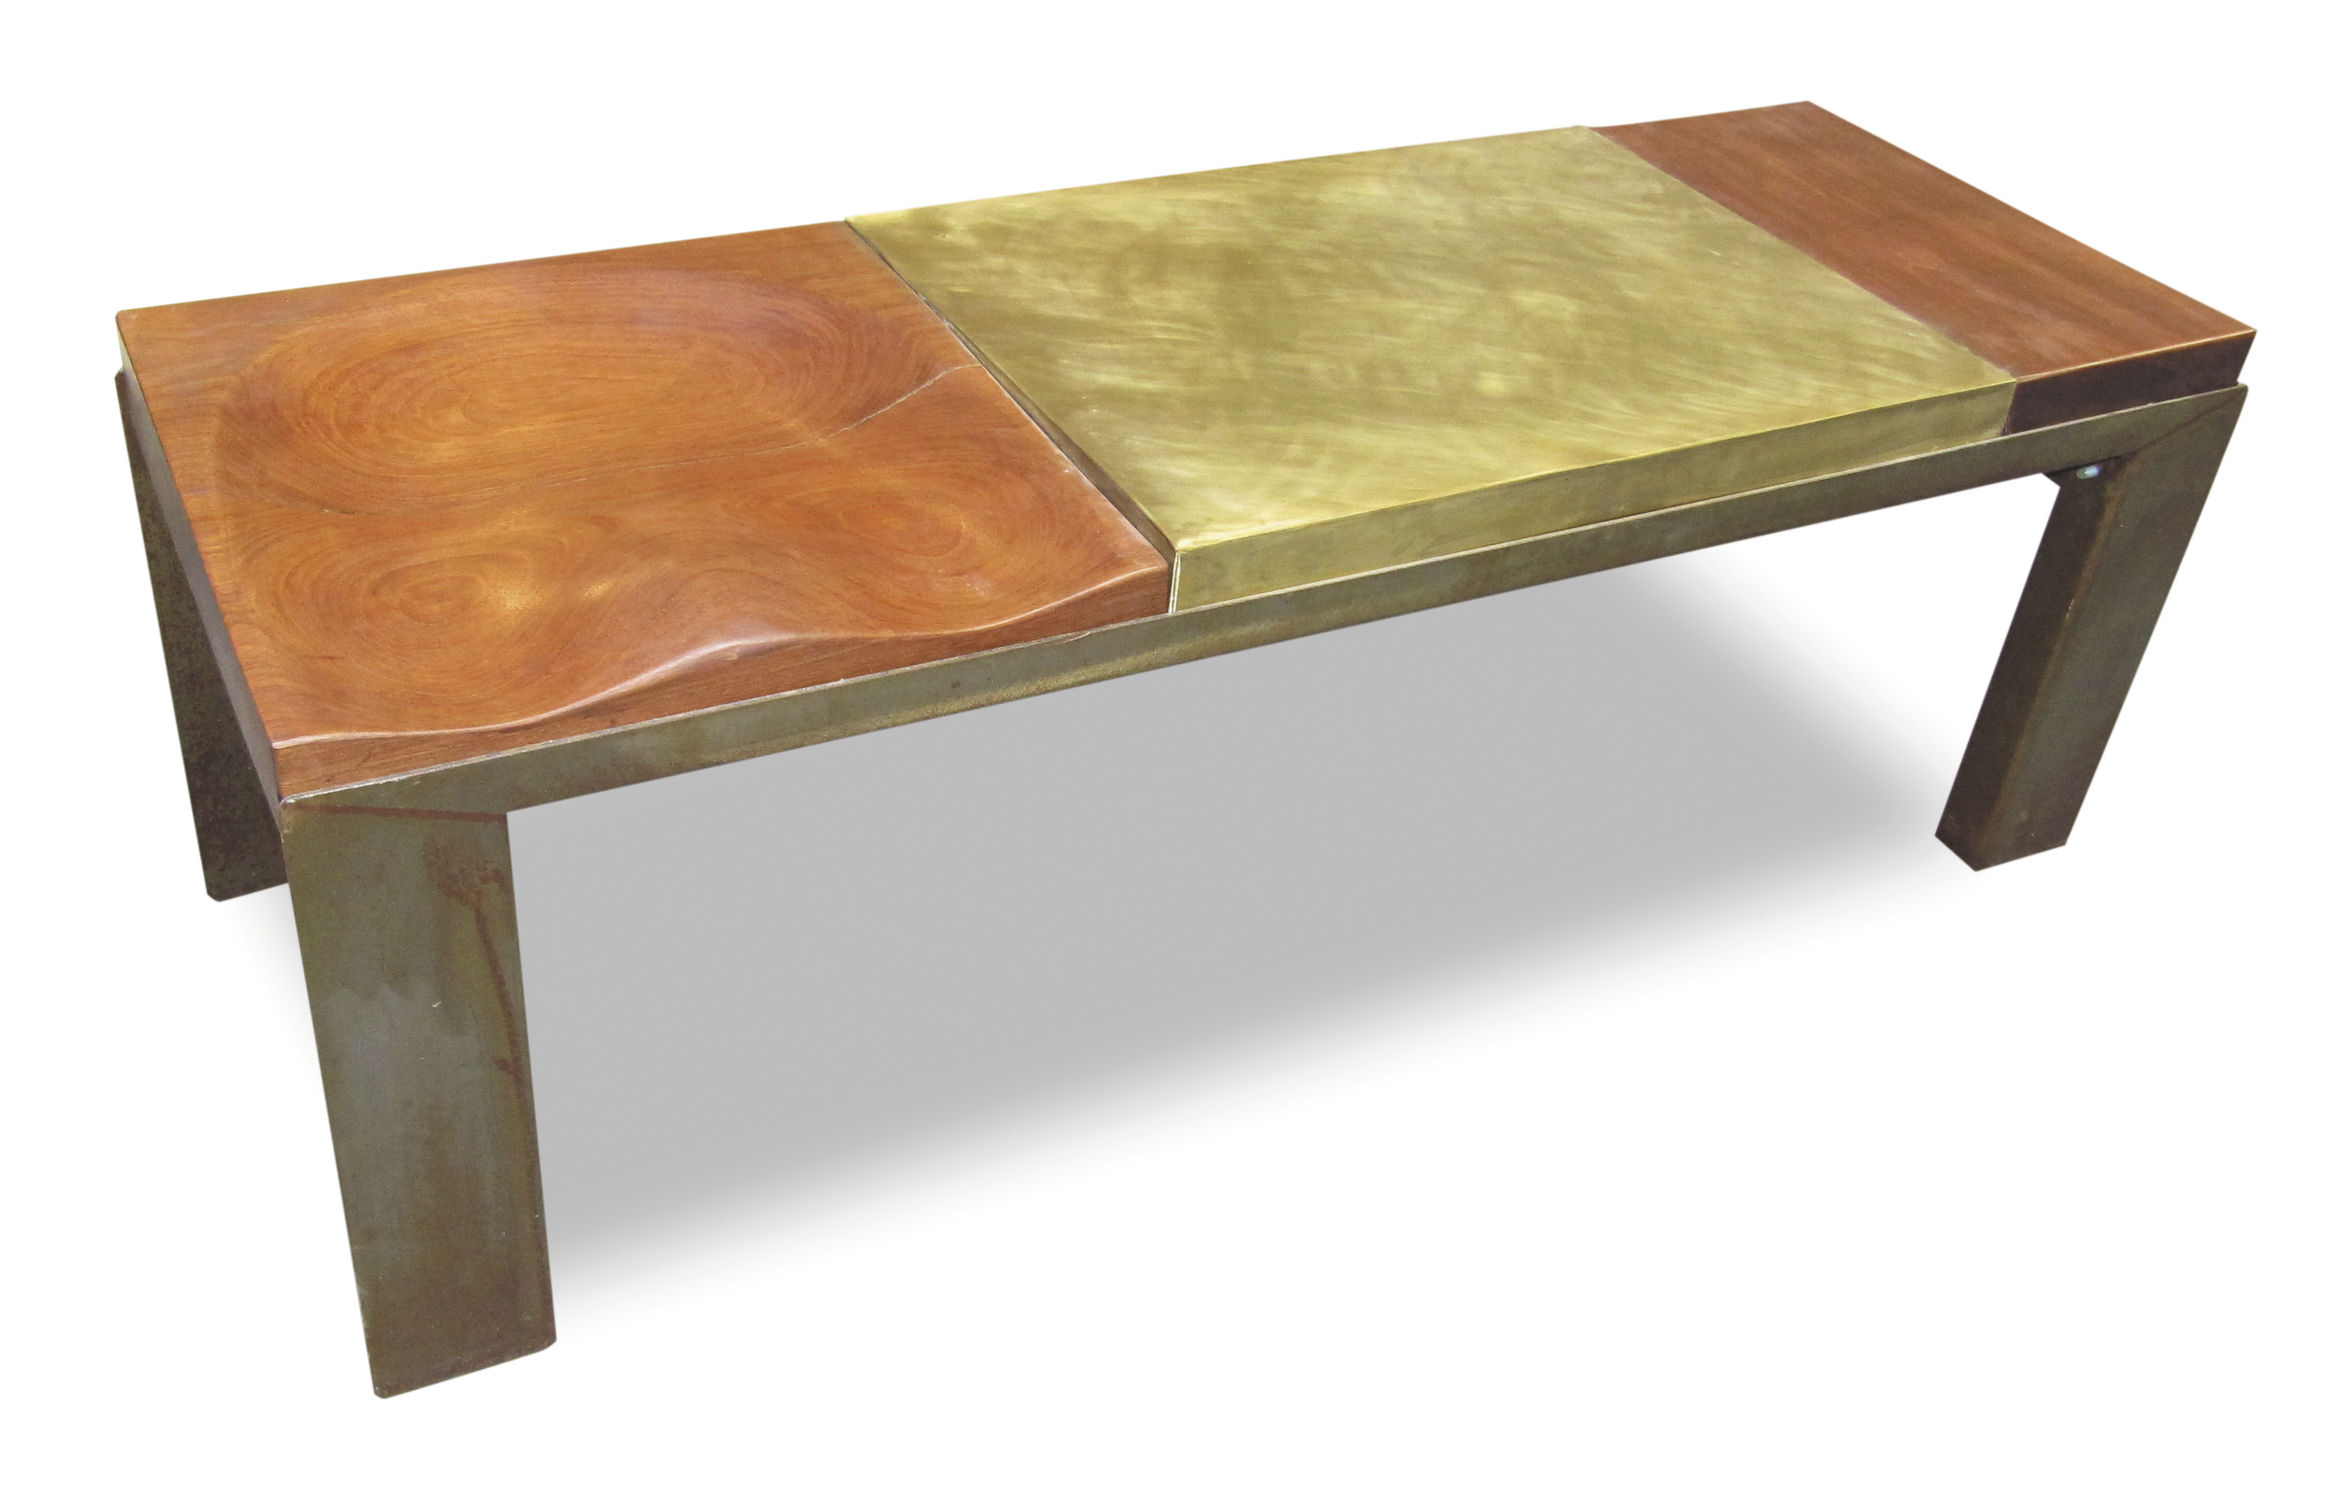 ici furniture. Original Design Bench / Oak Steel Brass - BRASS BENCH Ici Furniture D